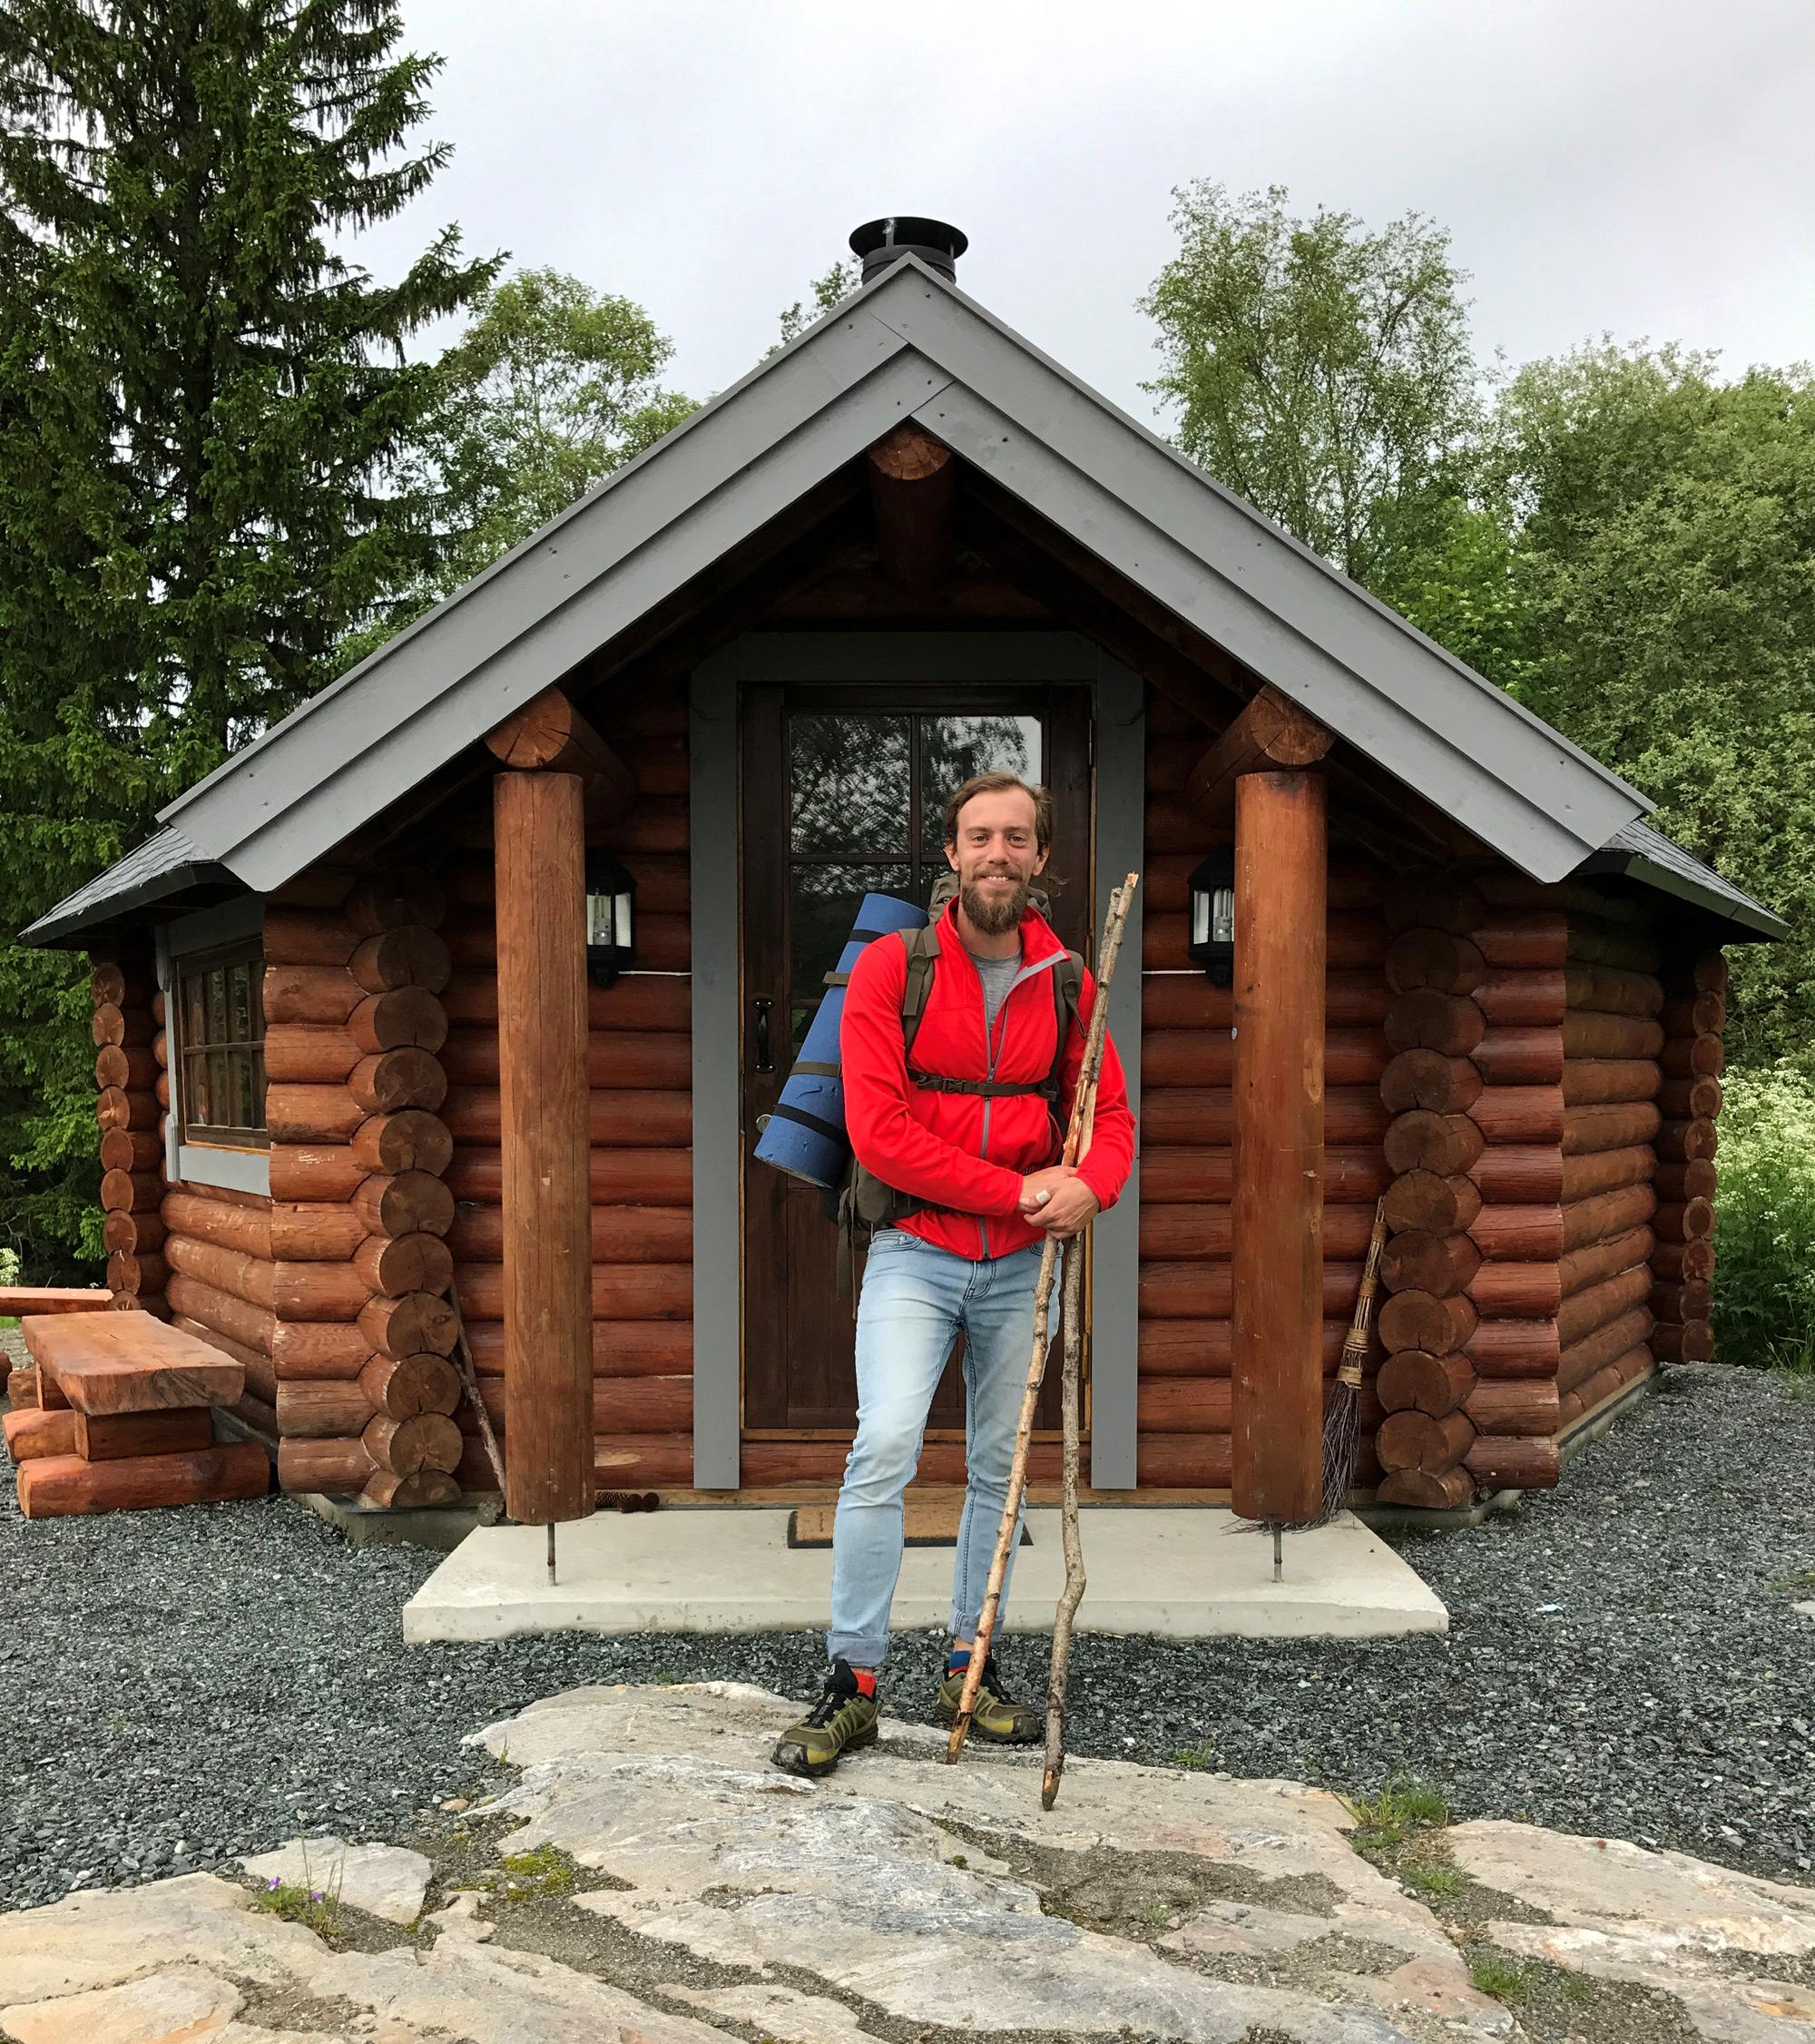 Troset i Levanger Kommune: foran grillhytta. Copyright: Heidi Troset